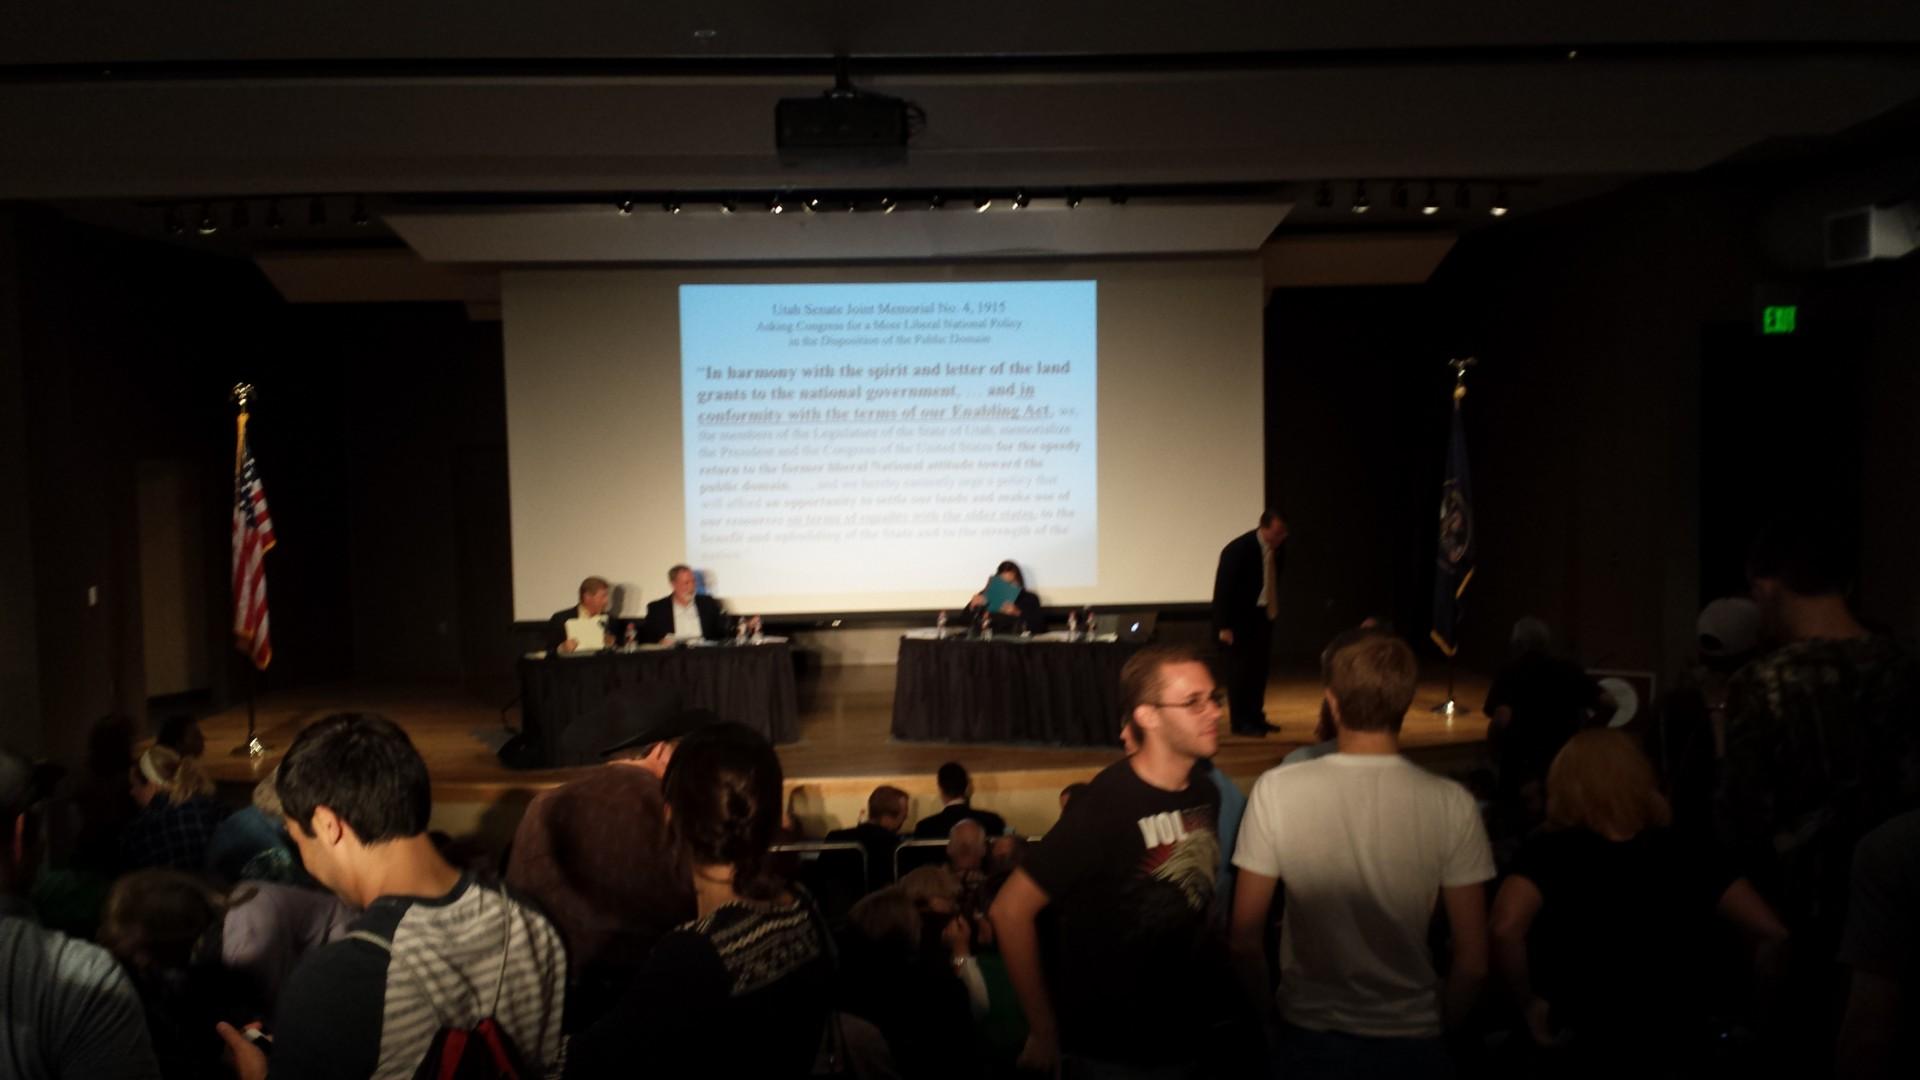 Who should control public lands debate. SUU, Cedar City, Utah Spetember 19, 2014 | Photo by T.S Romney St. George News